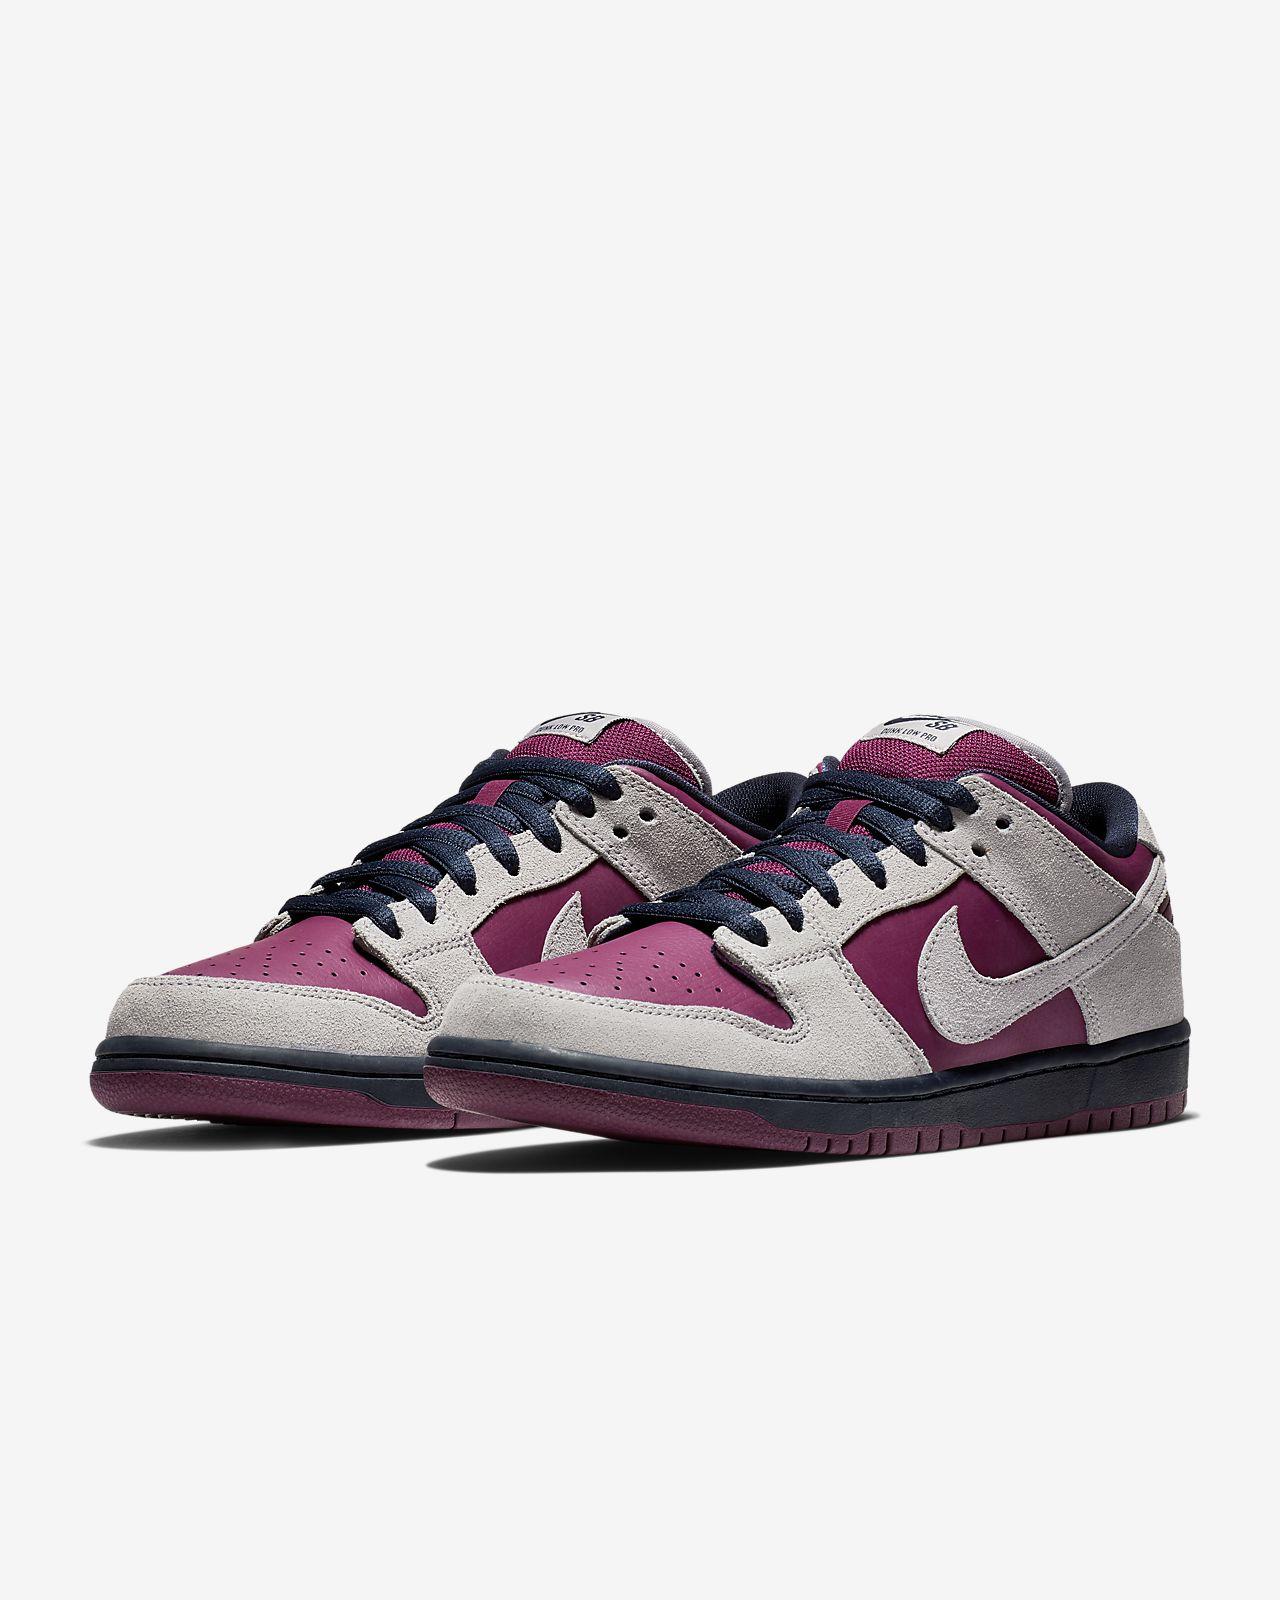 best service 2e538 02f35 Nike SB Dunk Low Pro Skate Shoe